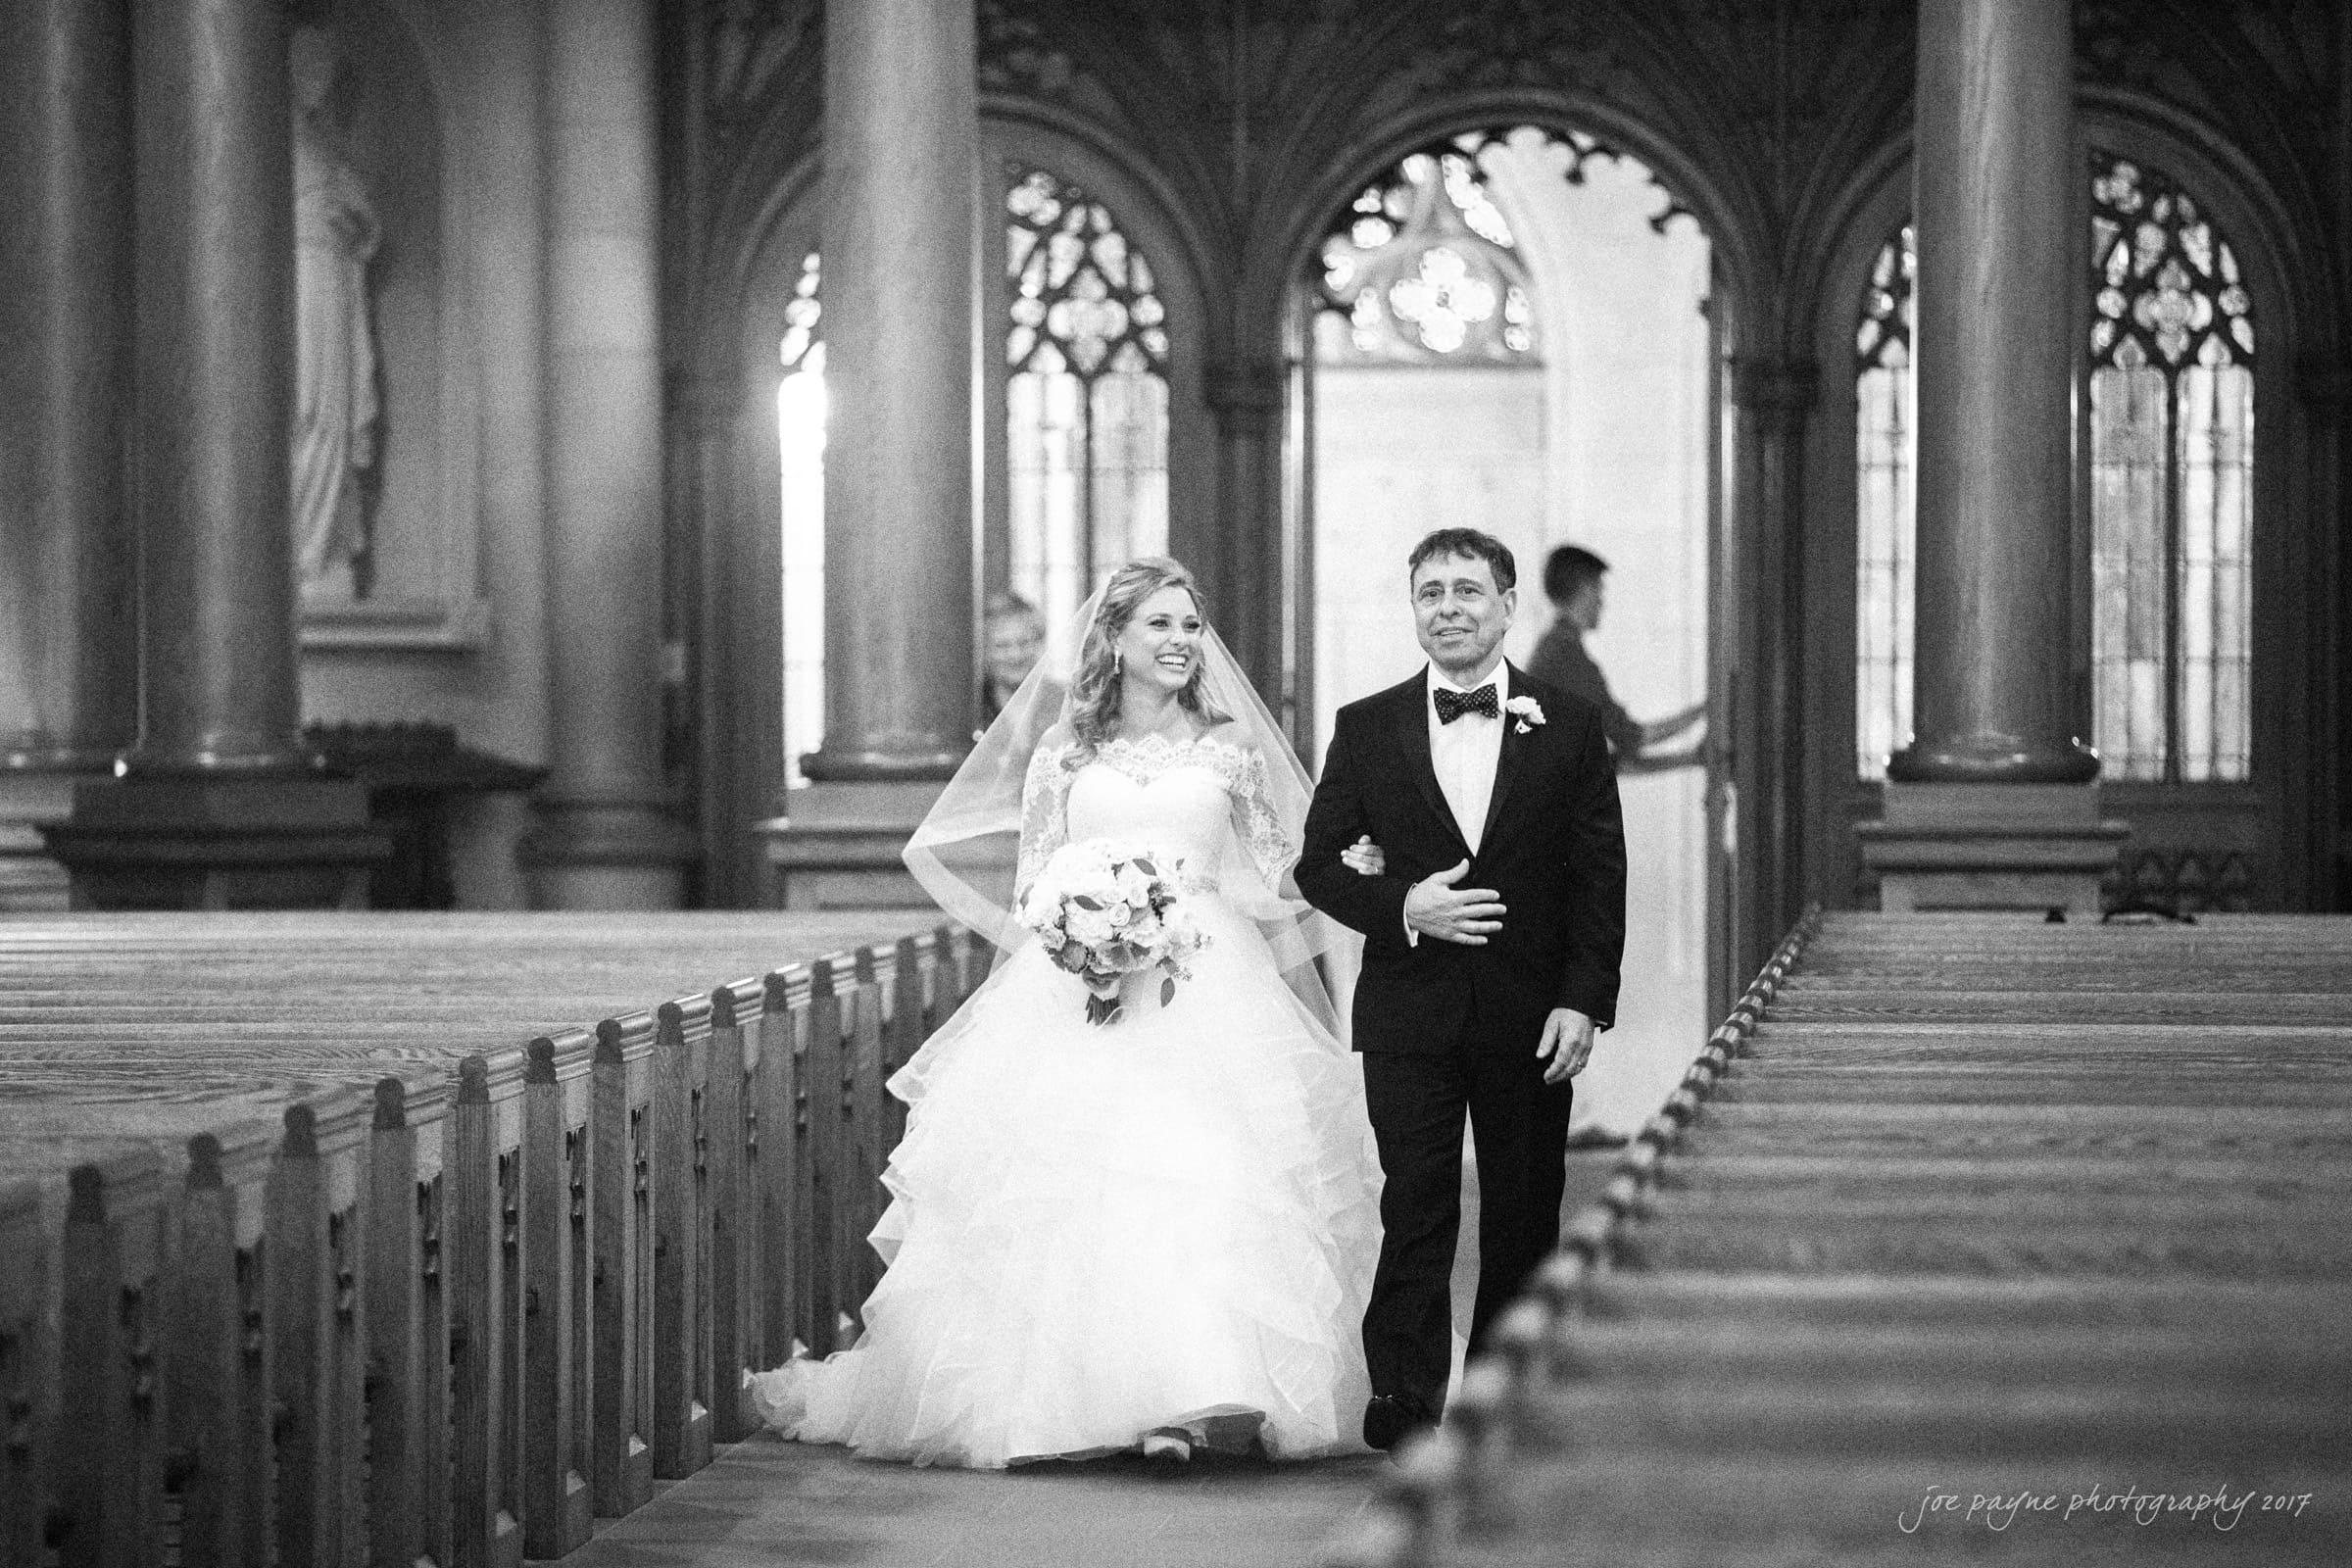 duke chapel wedding photos – Sara and her dad processional